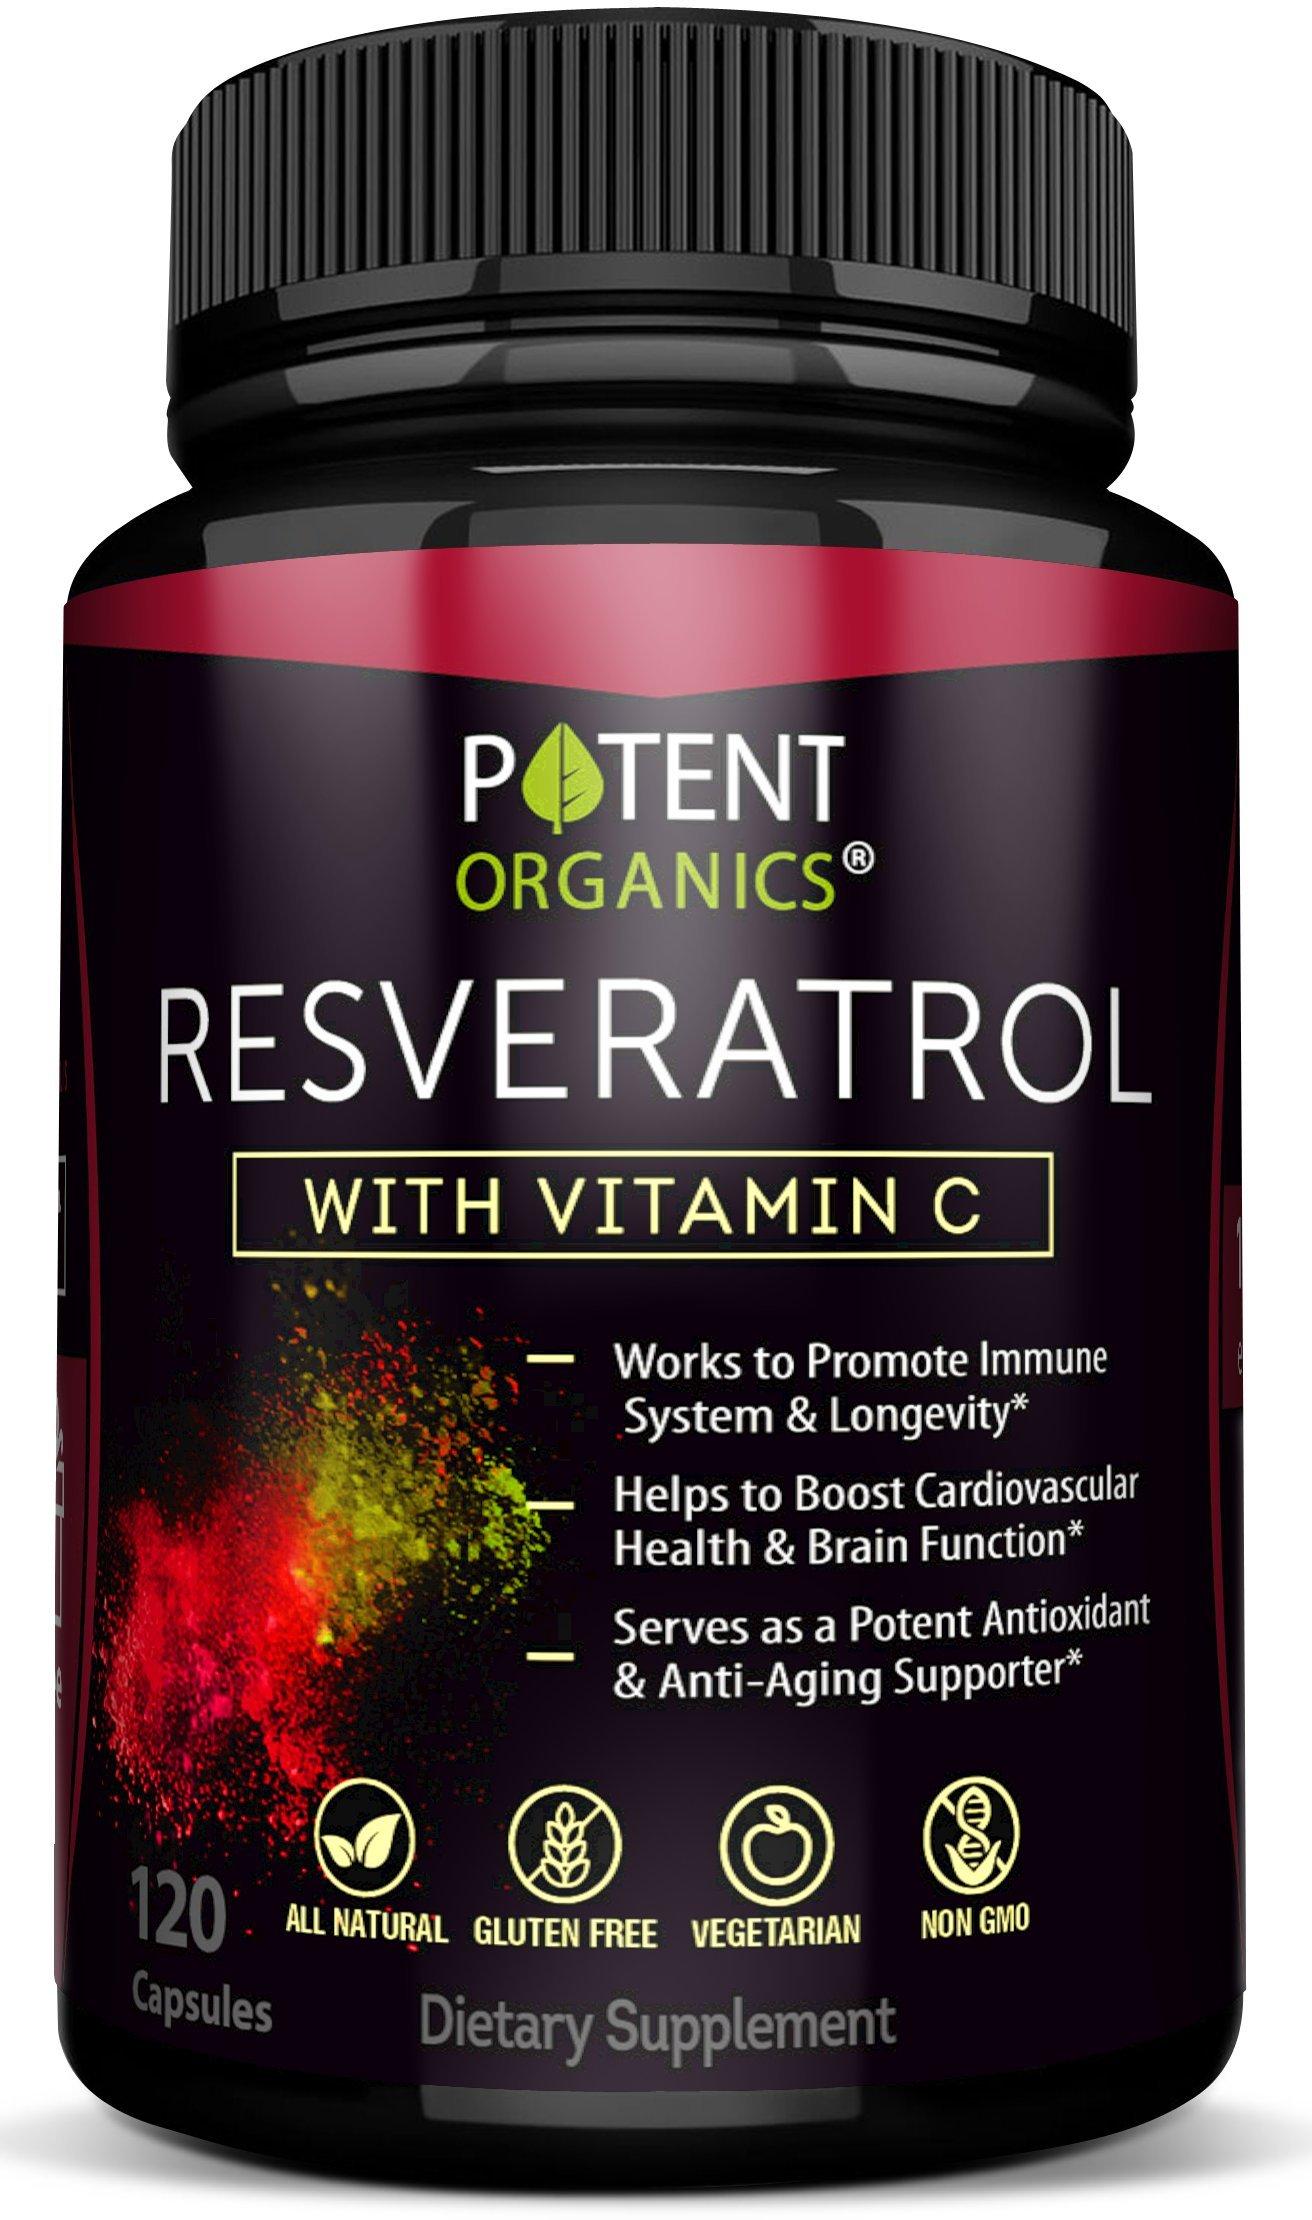 Extra Strong Resveratrol 1150mg - Anti-Aging Antioxidant Supplement - Promotes Immune & Cardiovascular Health - 120 Veggie Capsules with Trans Resveratrol, Vitamin C & Moringa - 100% Money Back